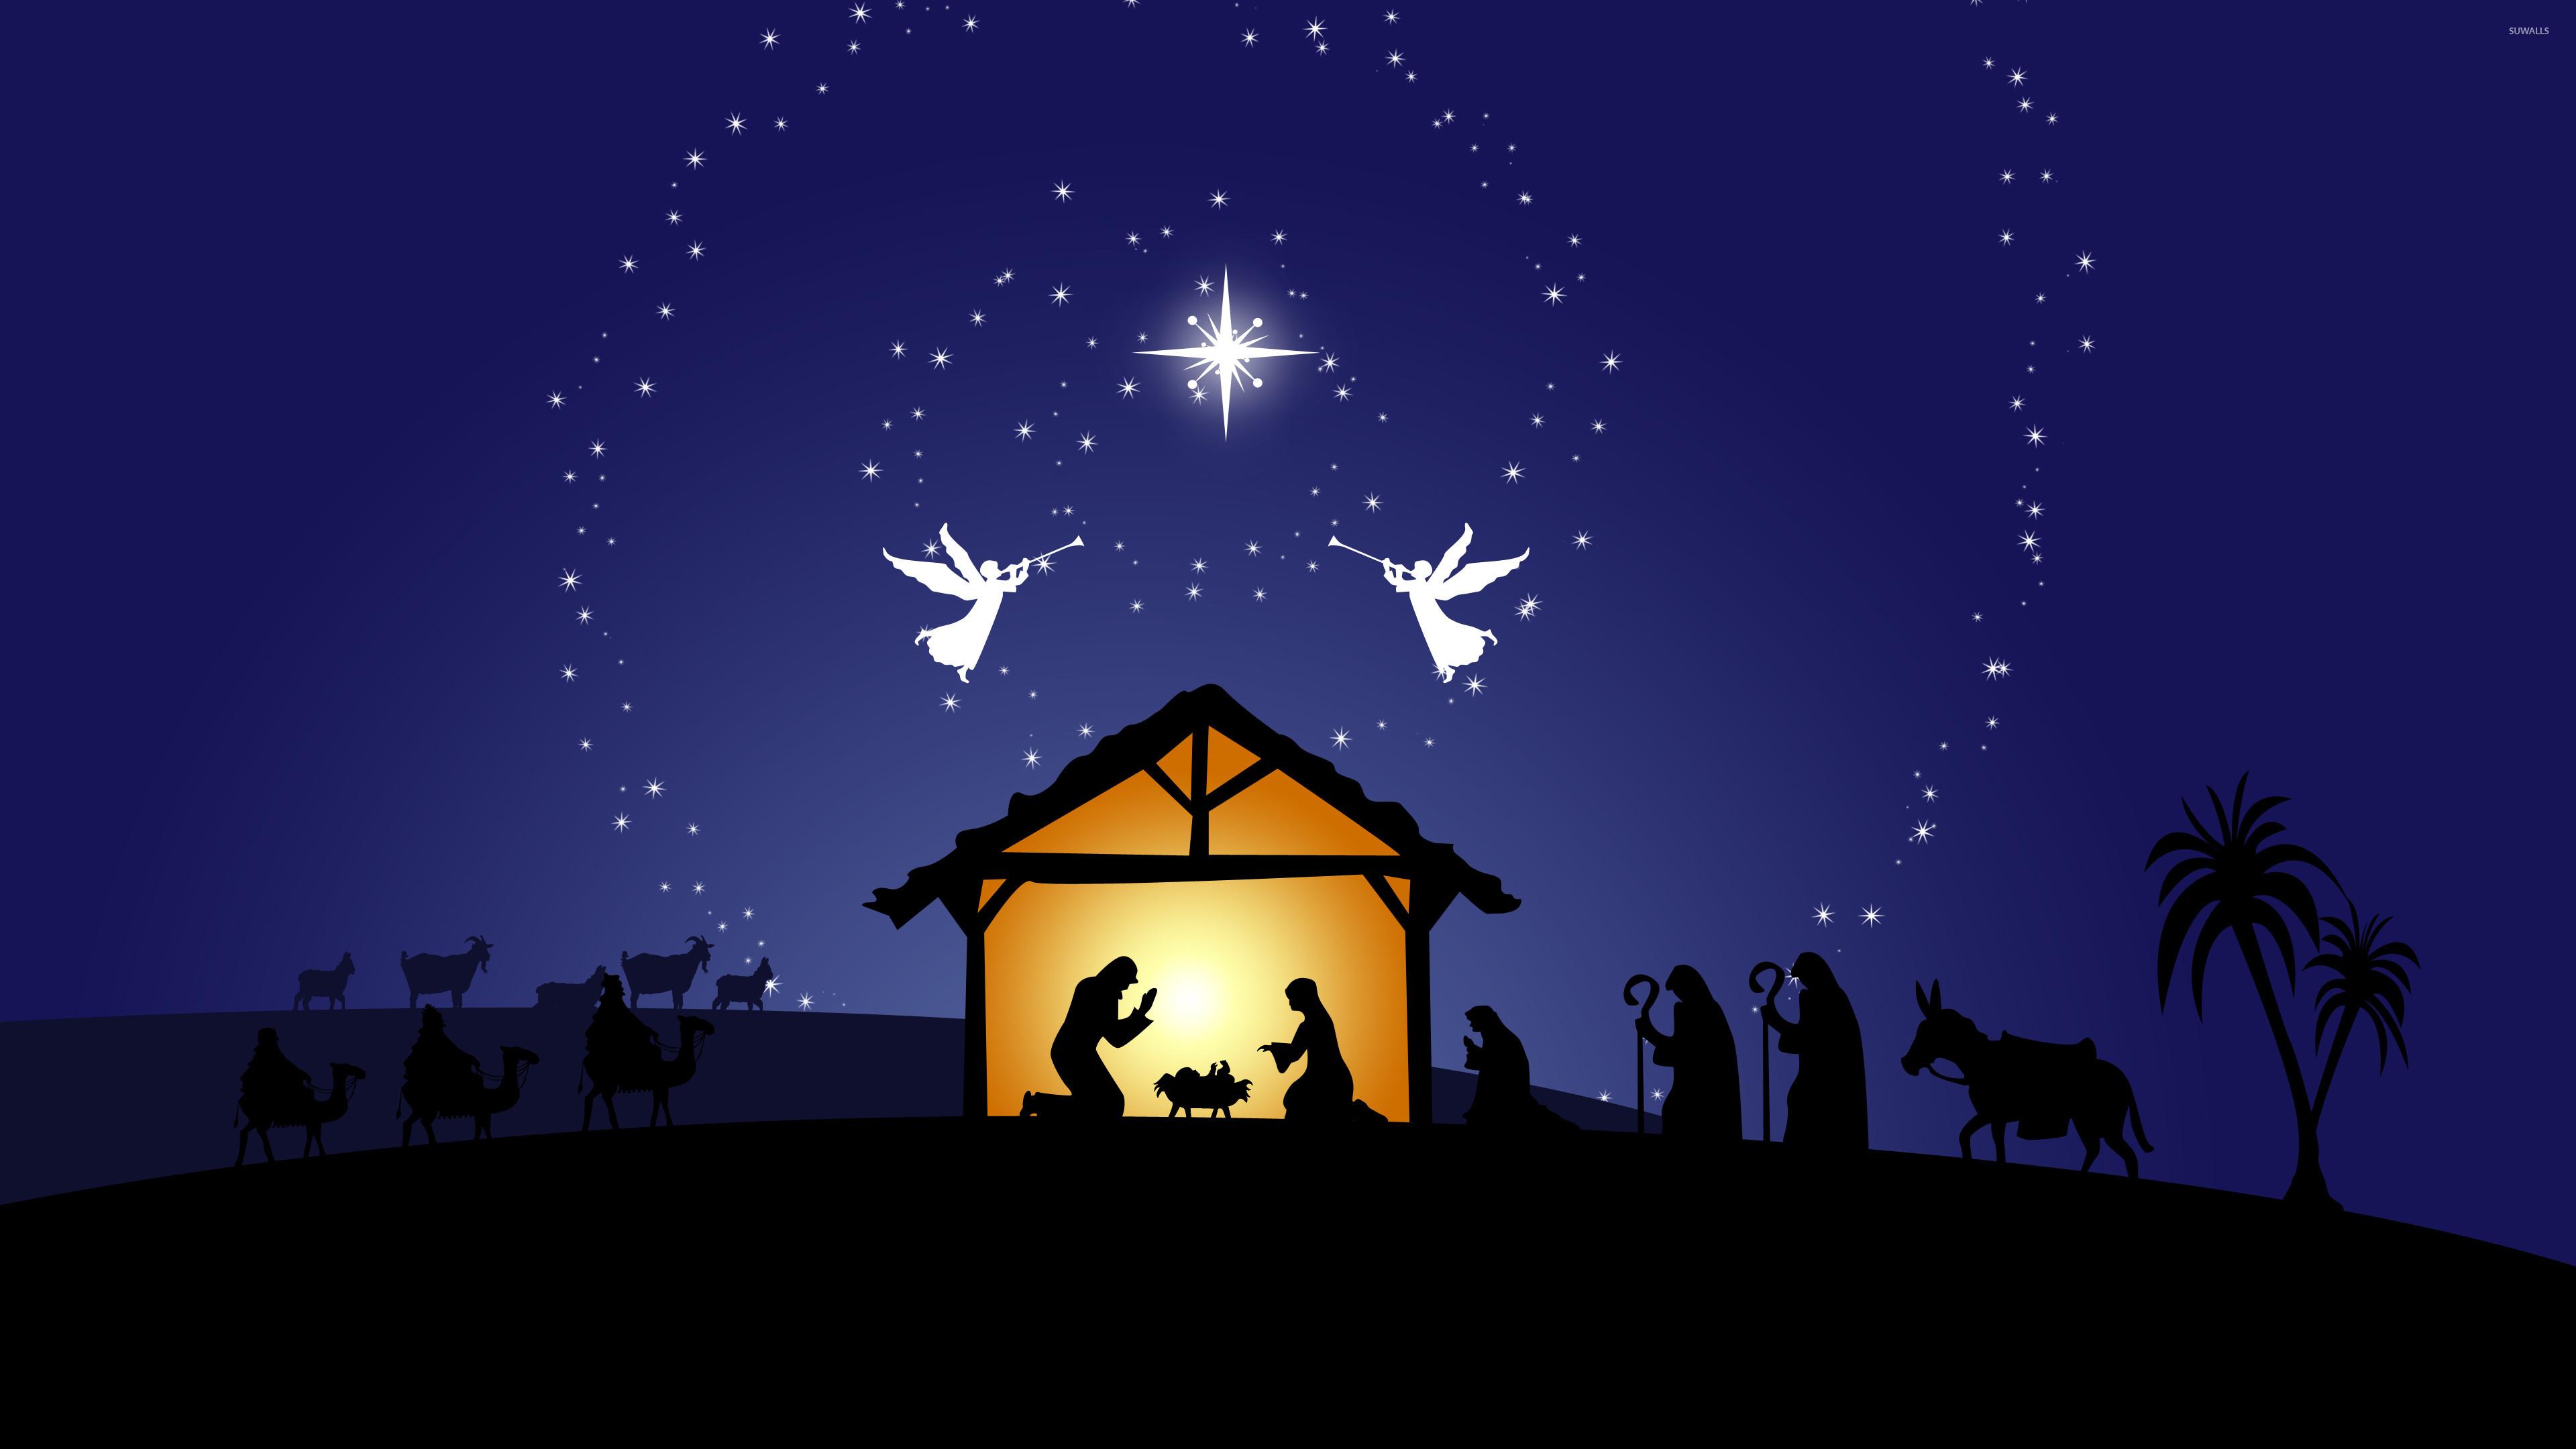 Res: 3840x2160, Nativity scene wallpaper